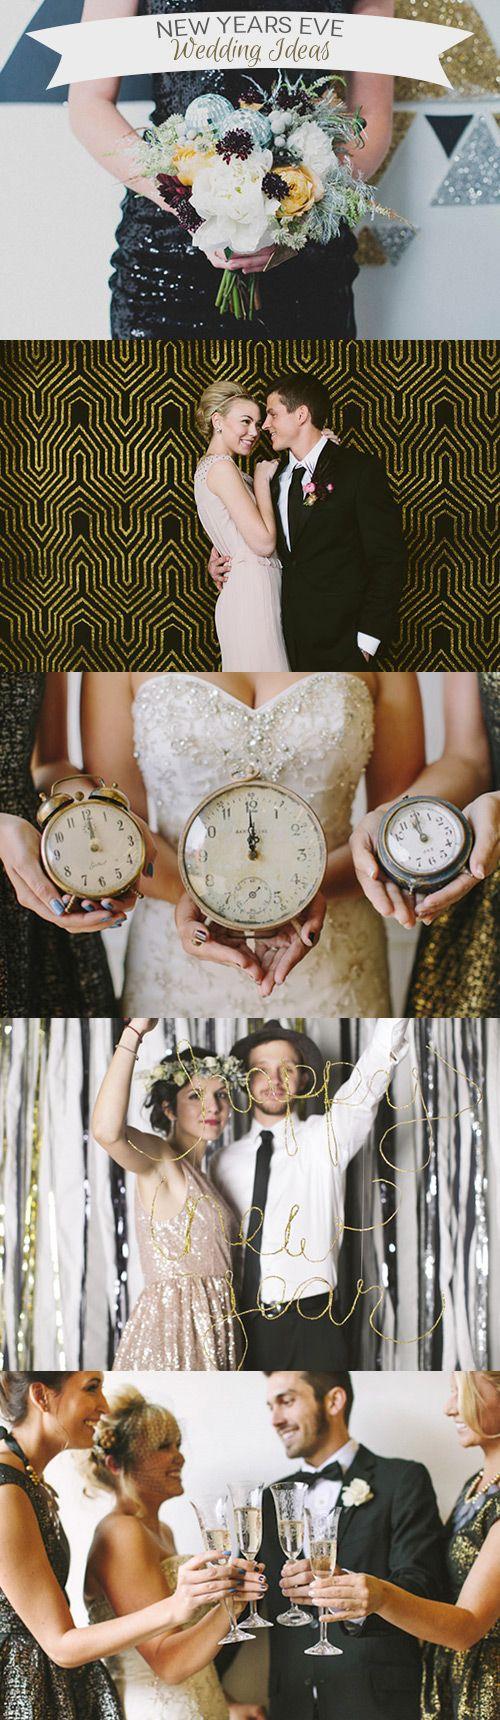 17 Simply Stylish New Years Eve Wedding Ideas | Simple ways to make your New Years Eve wedding sparkle | www.onefabday.com